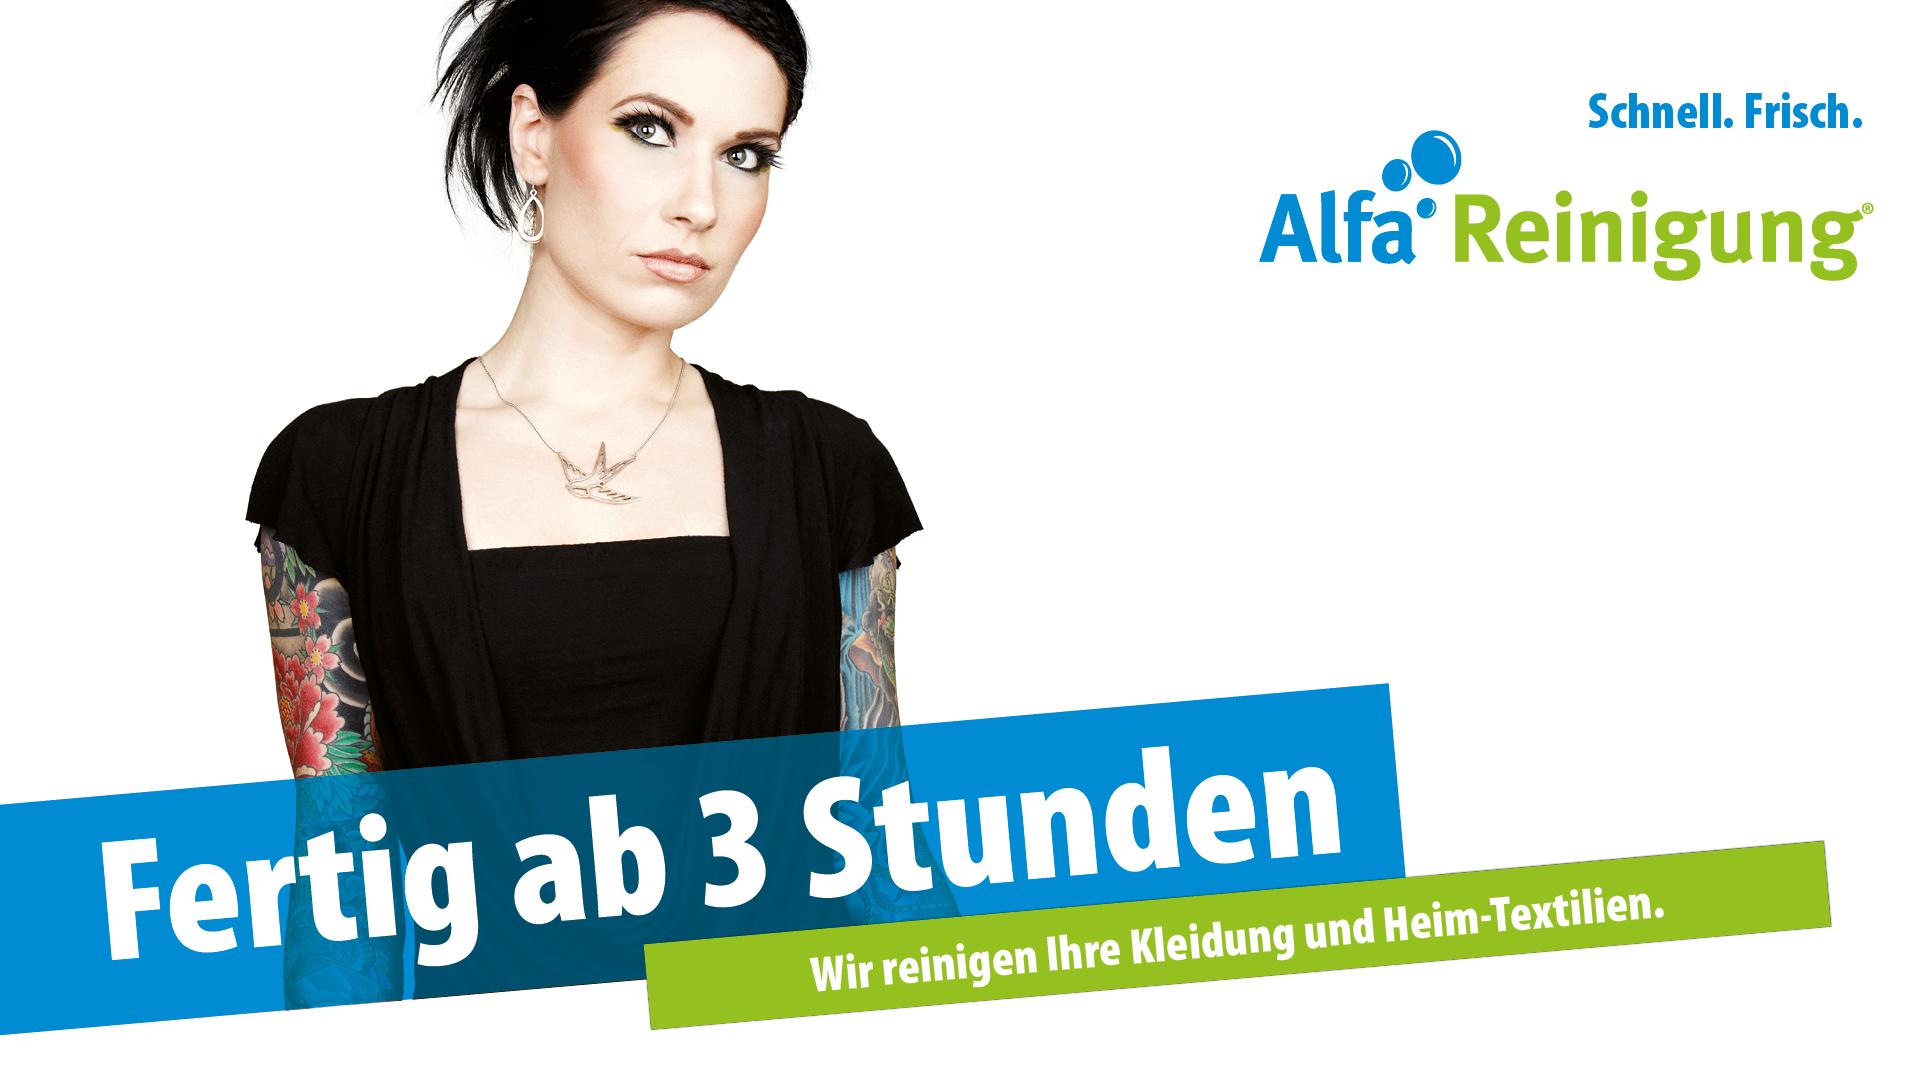 ALF-Screen-3Stunden-Frau